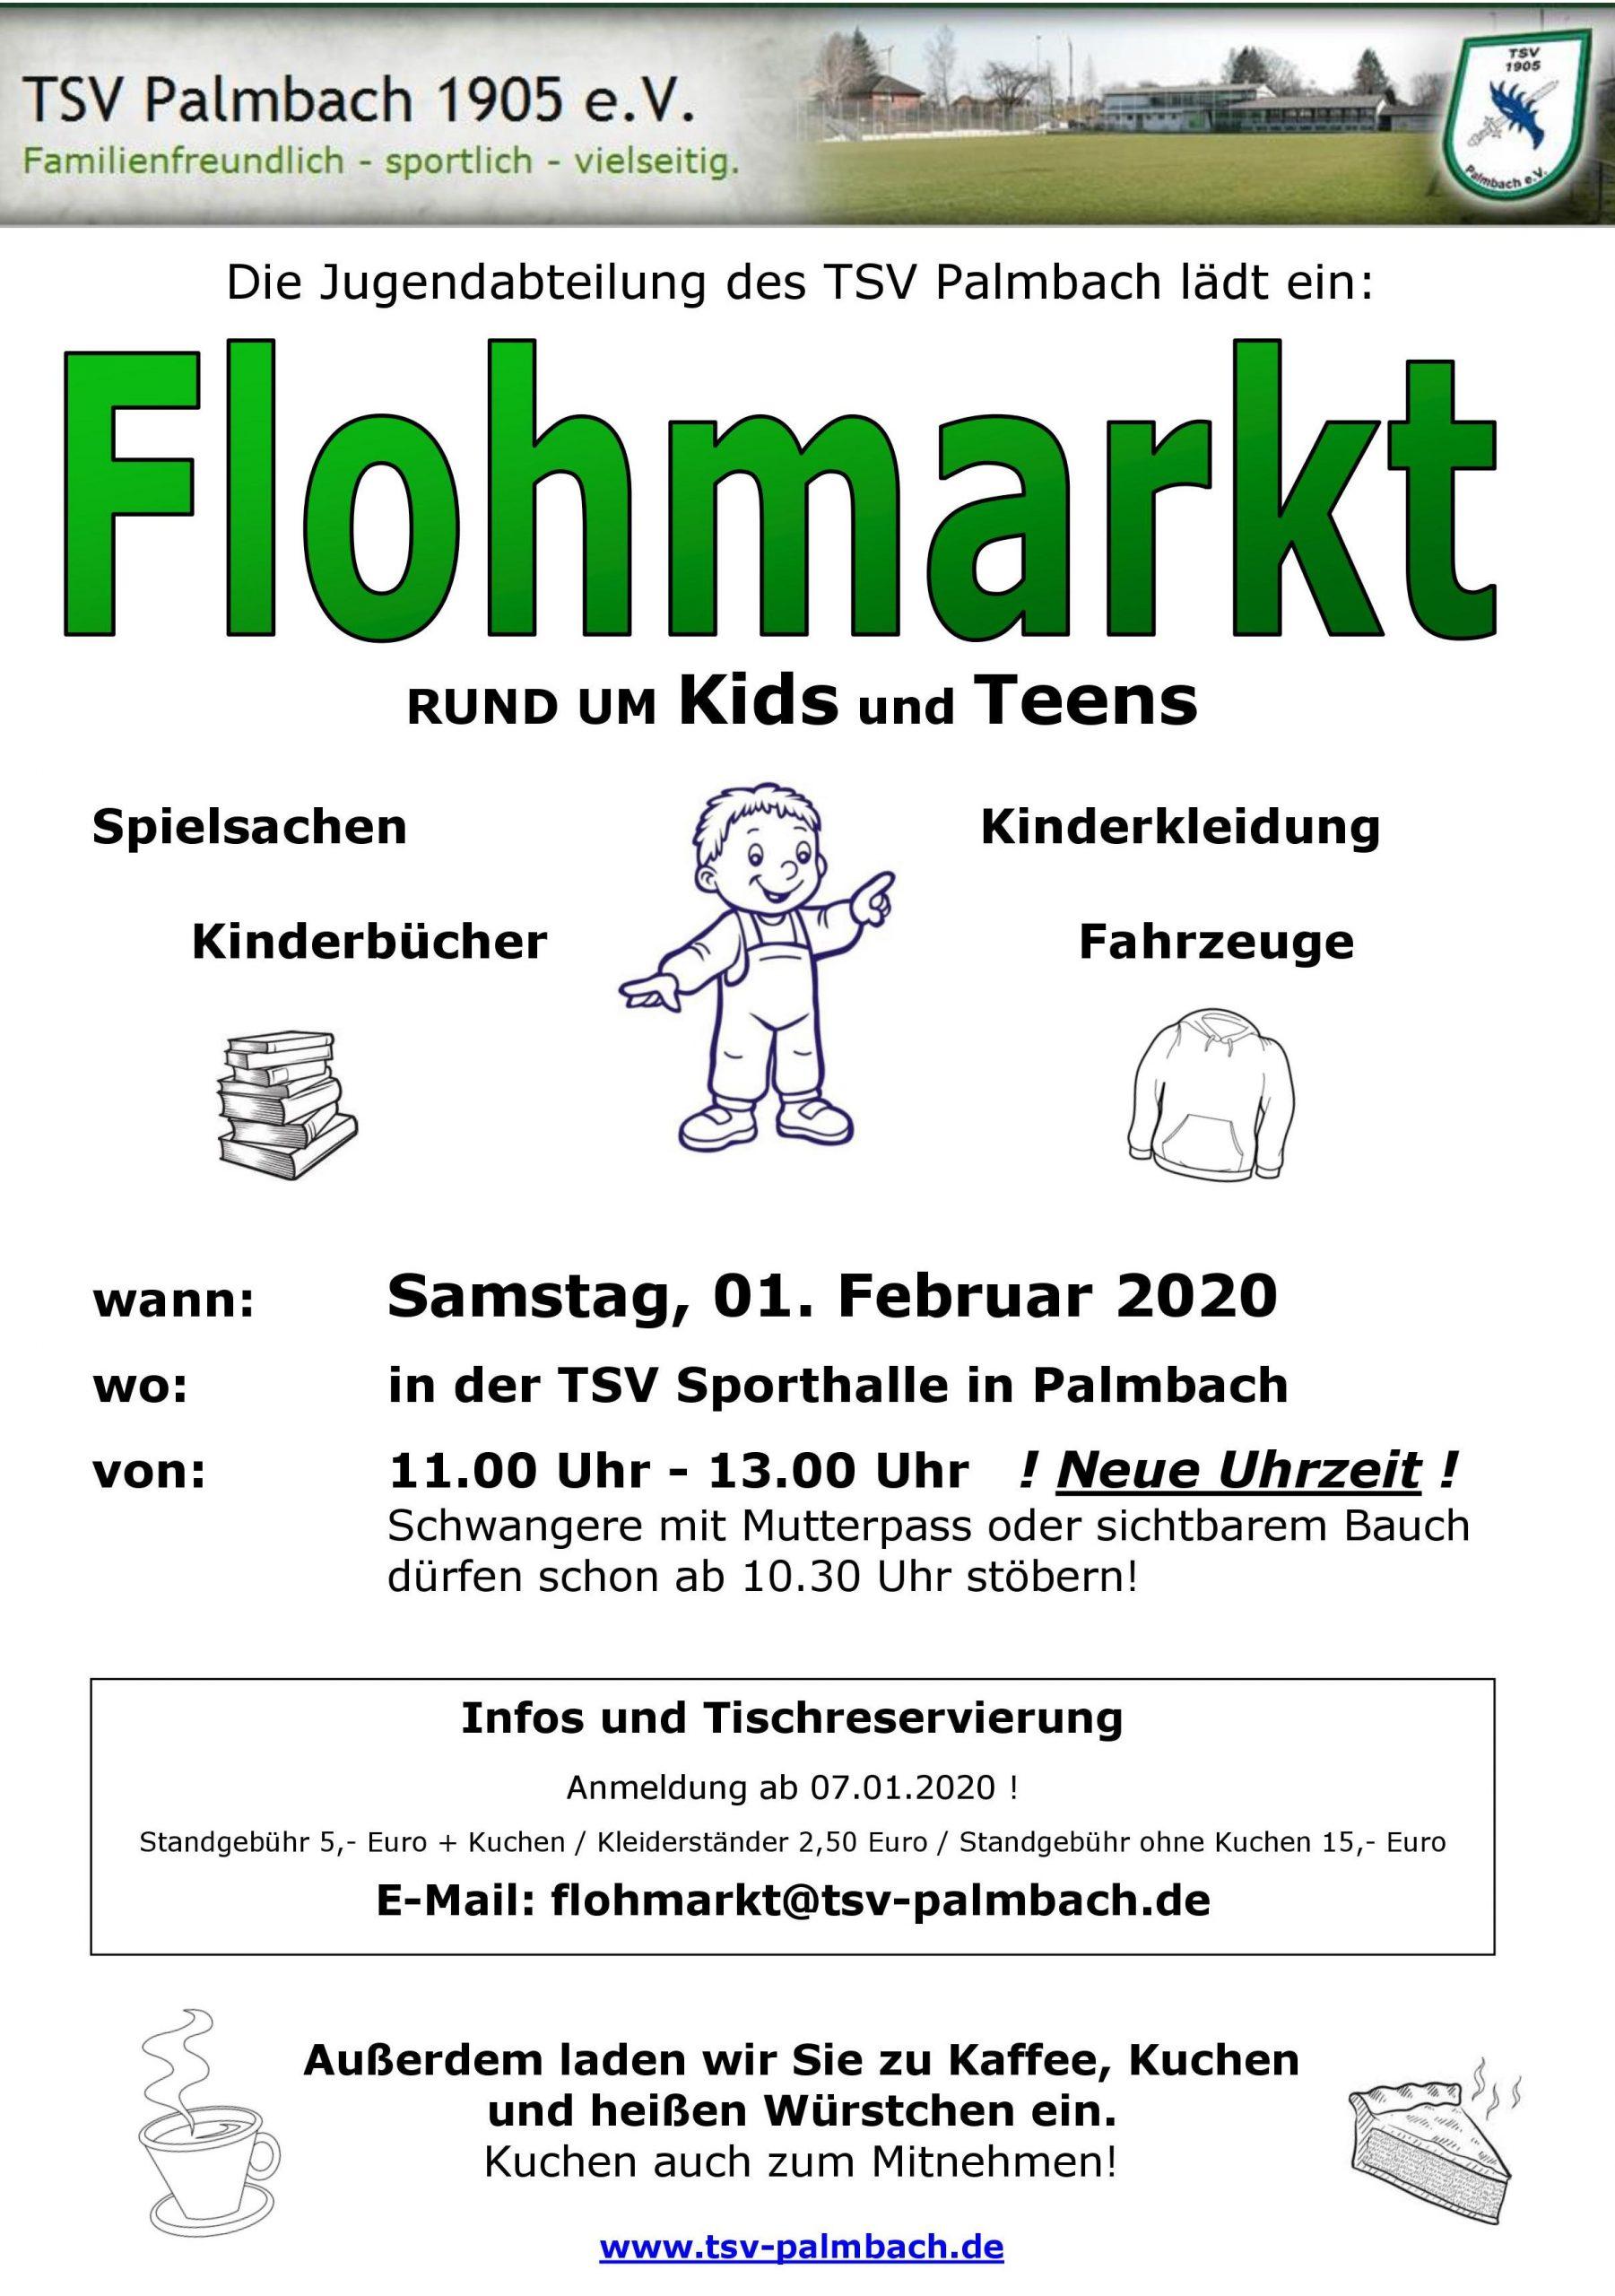 Kinder-Flohmarkt TSV Palmbach am 01.02.2020